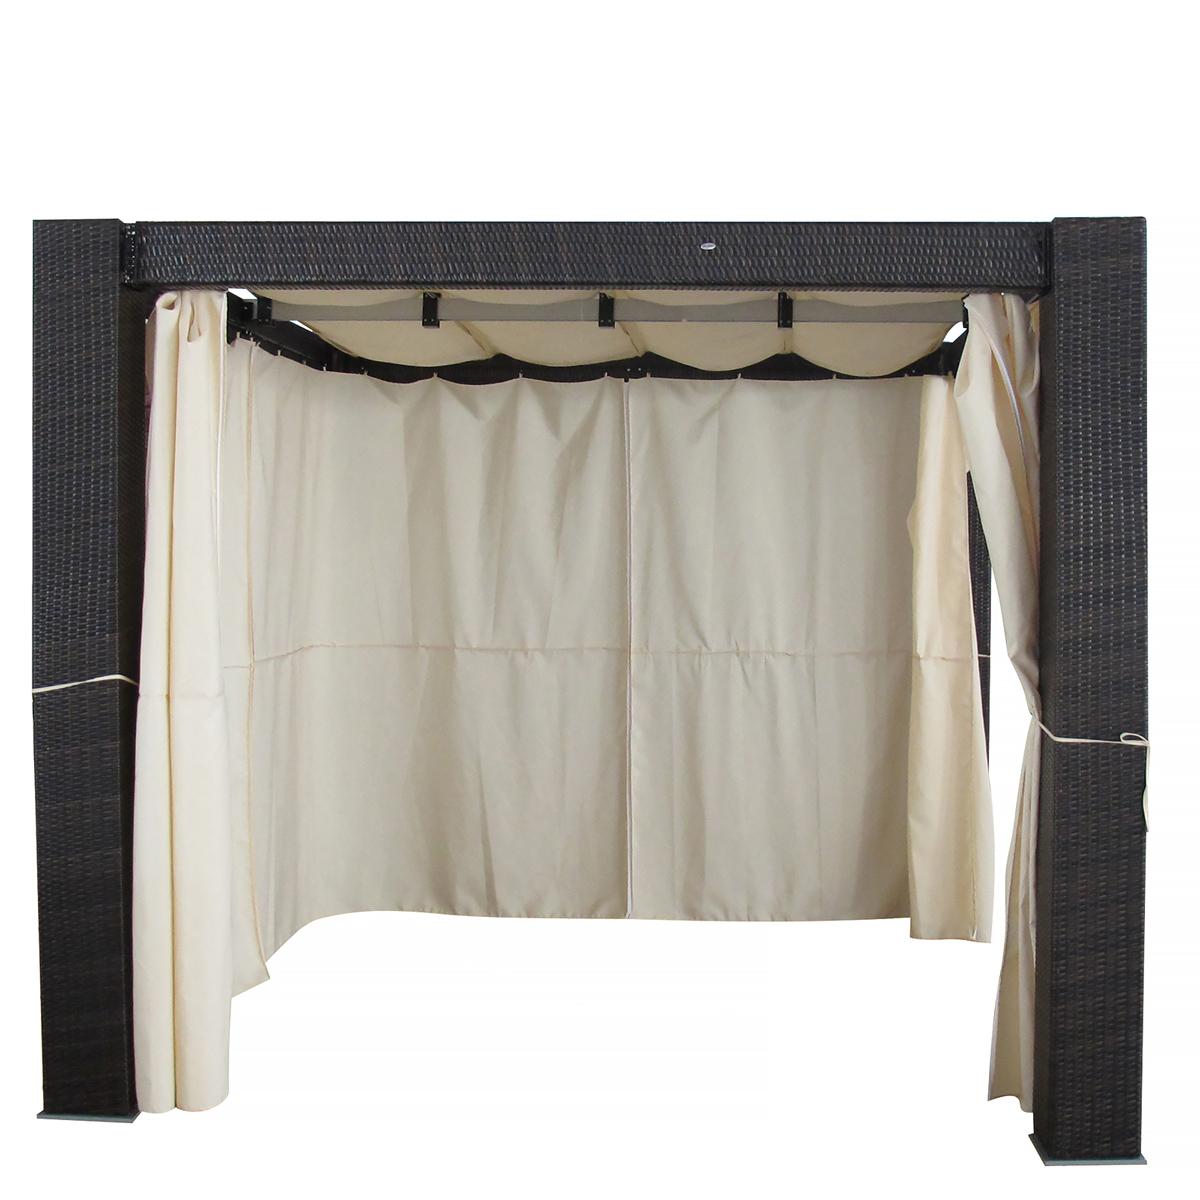 heaven garten rattan gazebo pavillion pergola gartenm bel. Black Bedroom Furniture Sets. Home Design Ideas